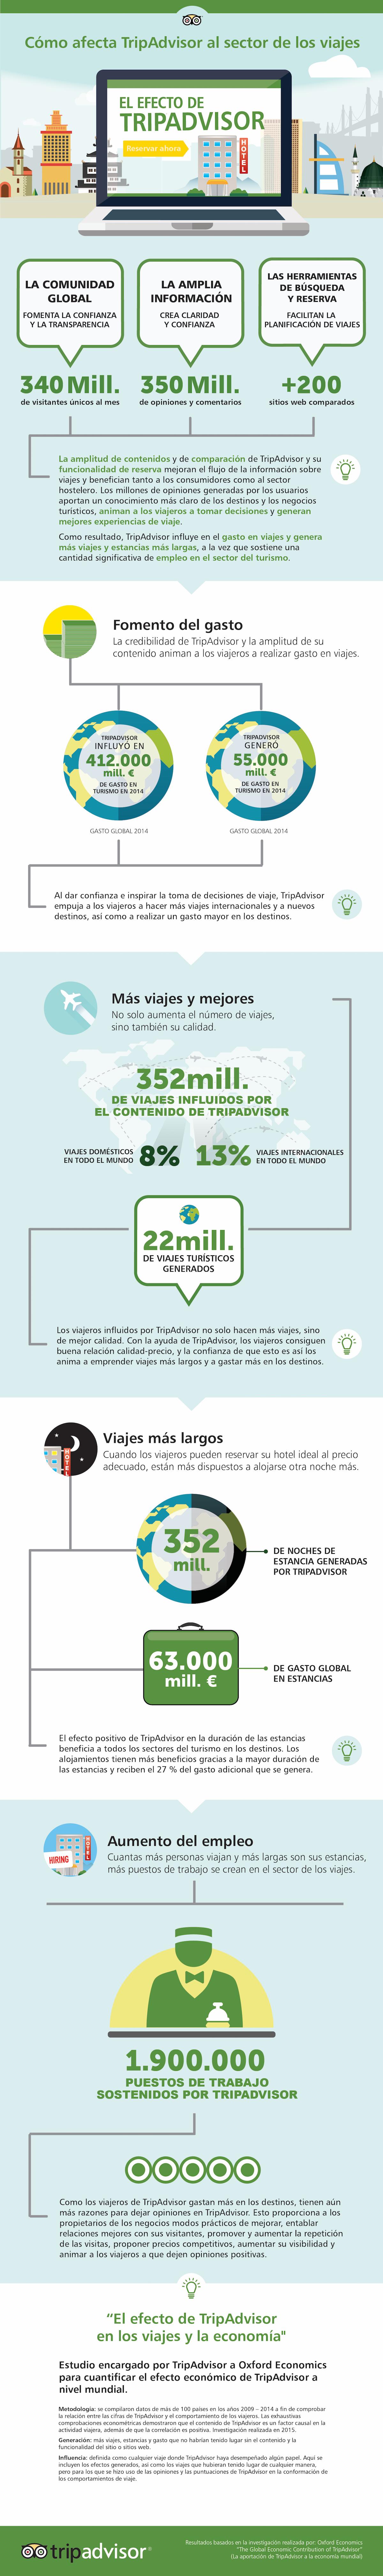 El efecto de TripAdvisor en el Sector de los Viajes #infografia #socialmedia #tourism